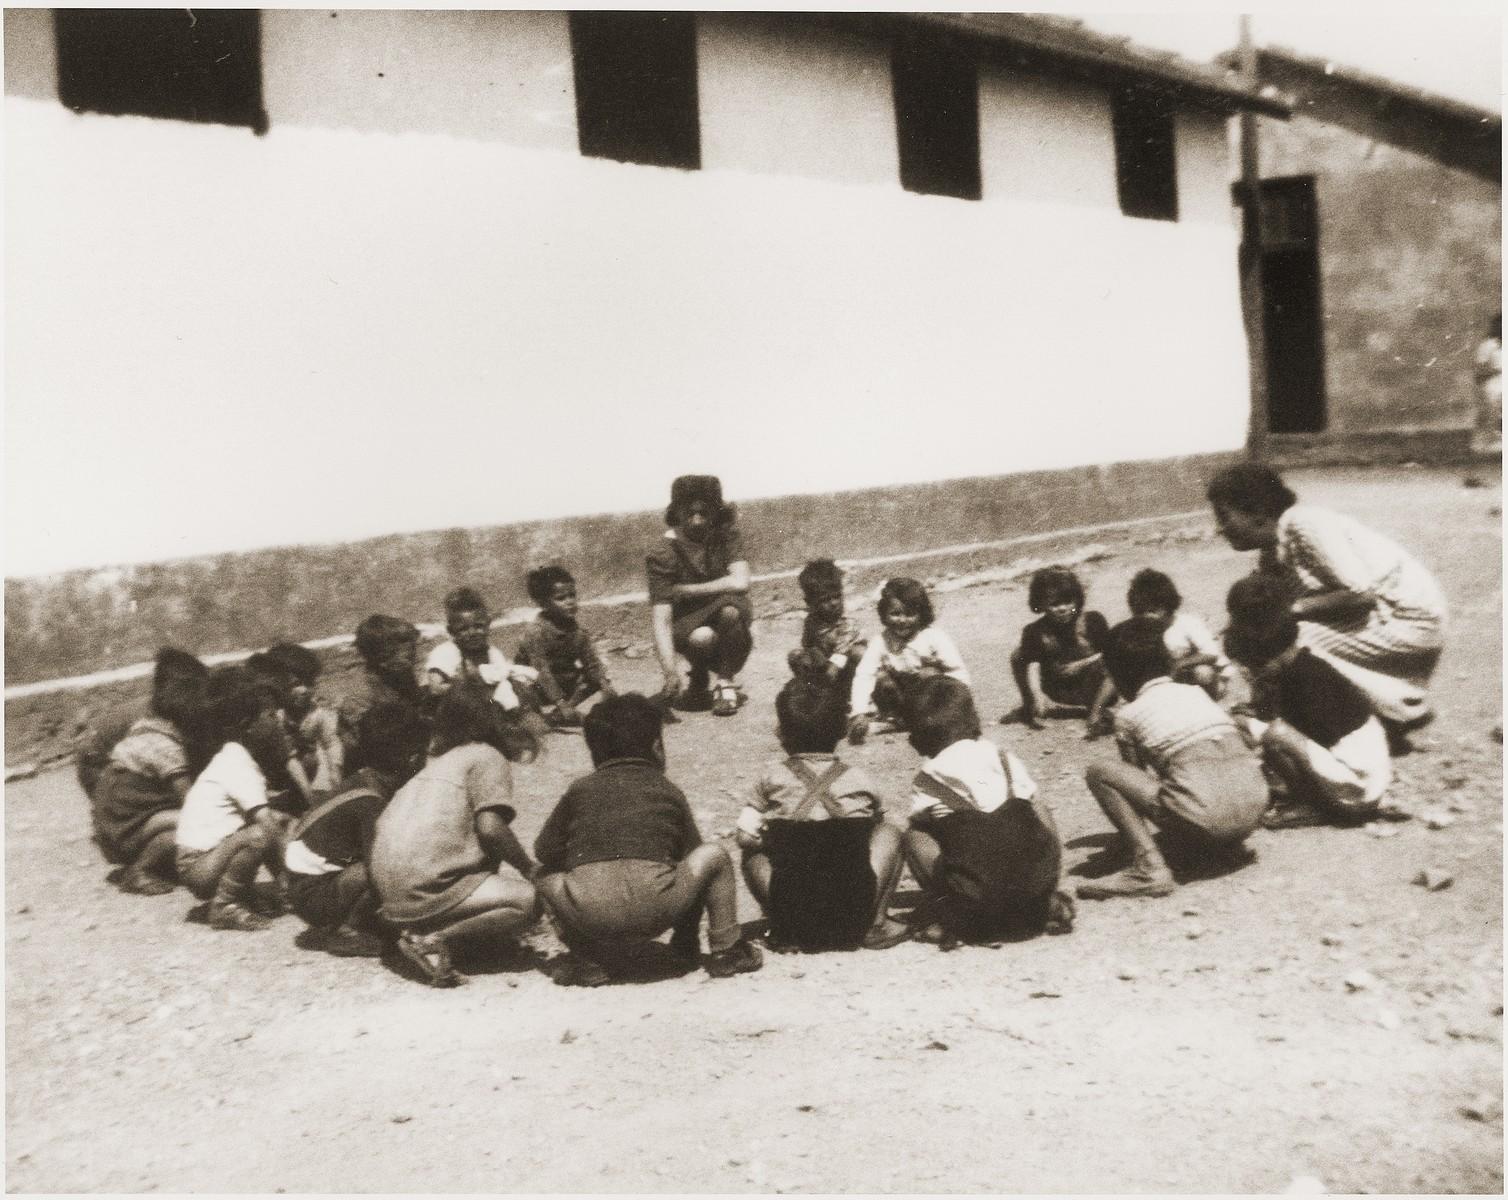 Children play games in Rivesaltes.